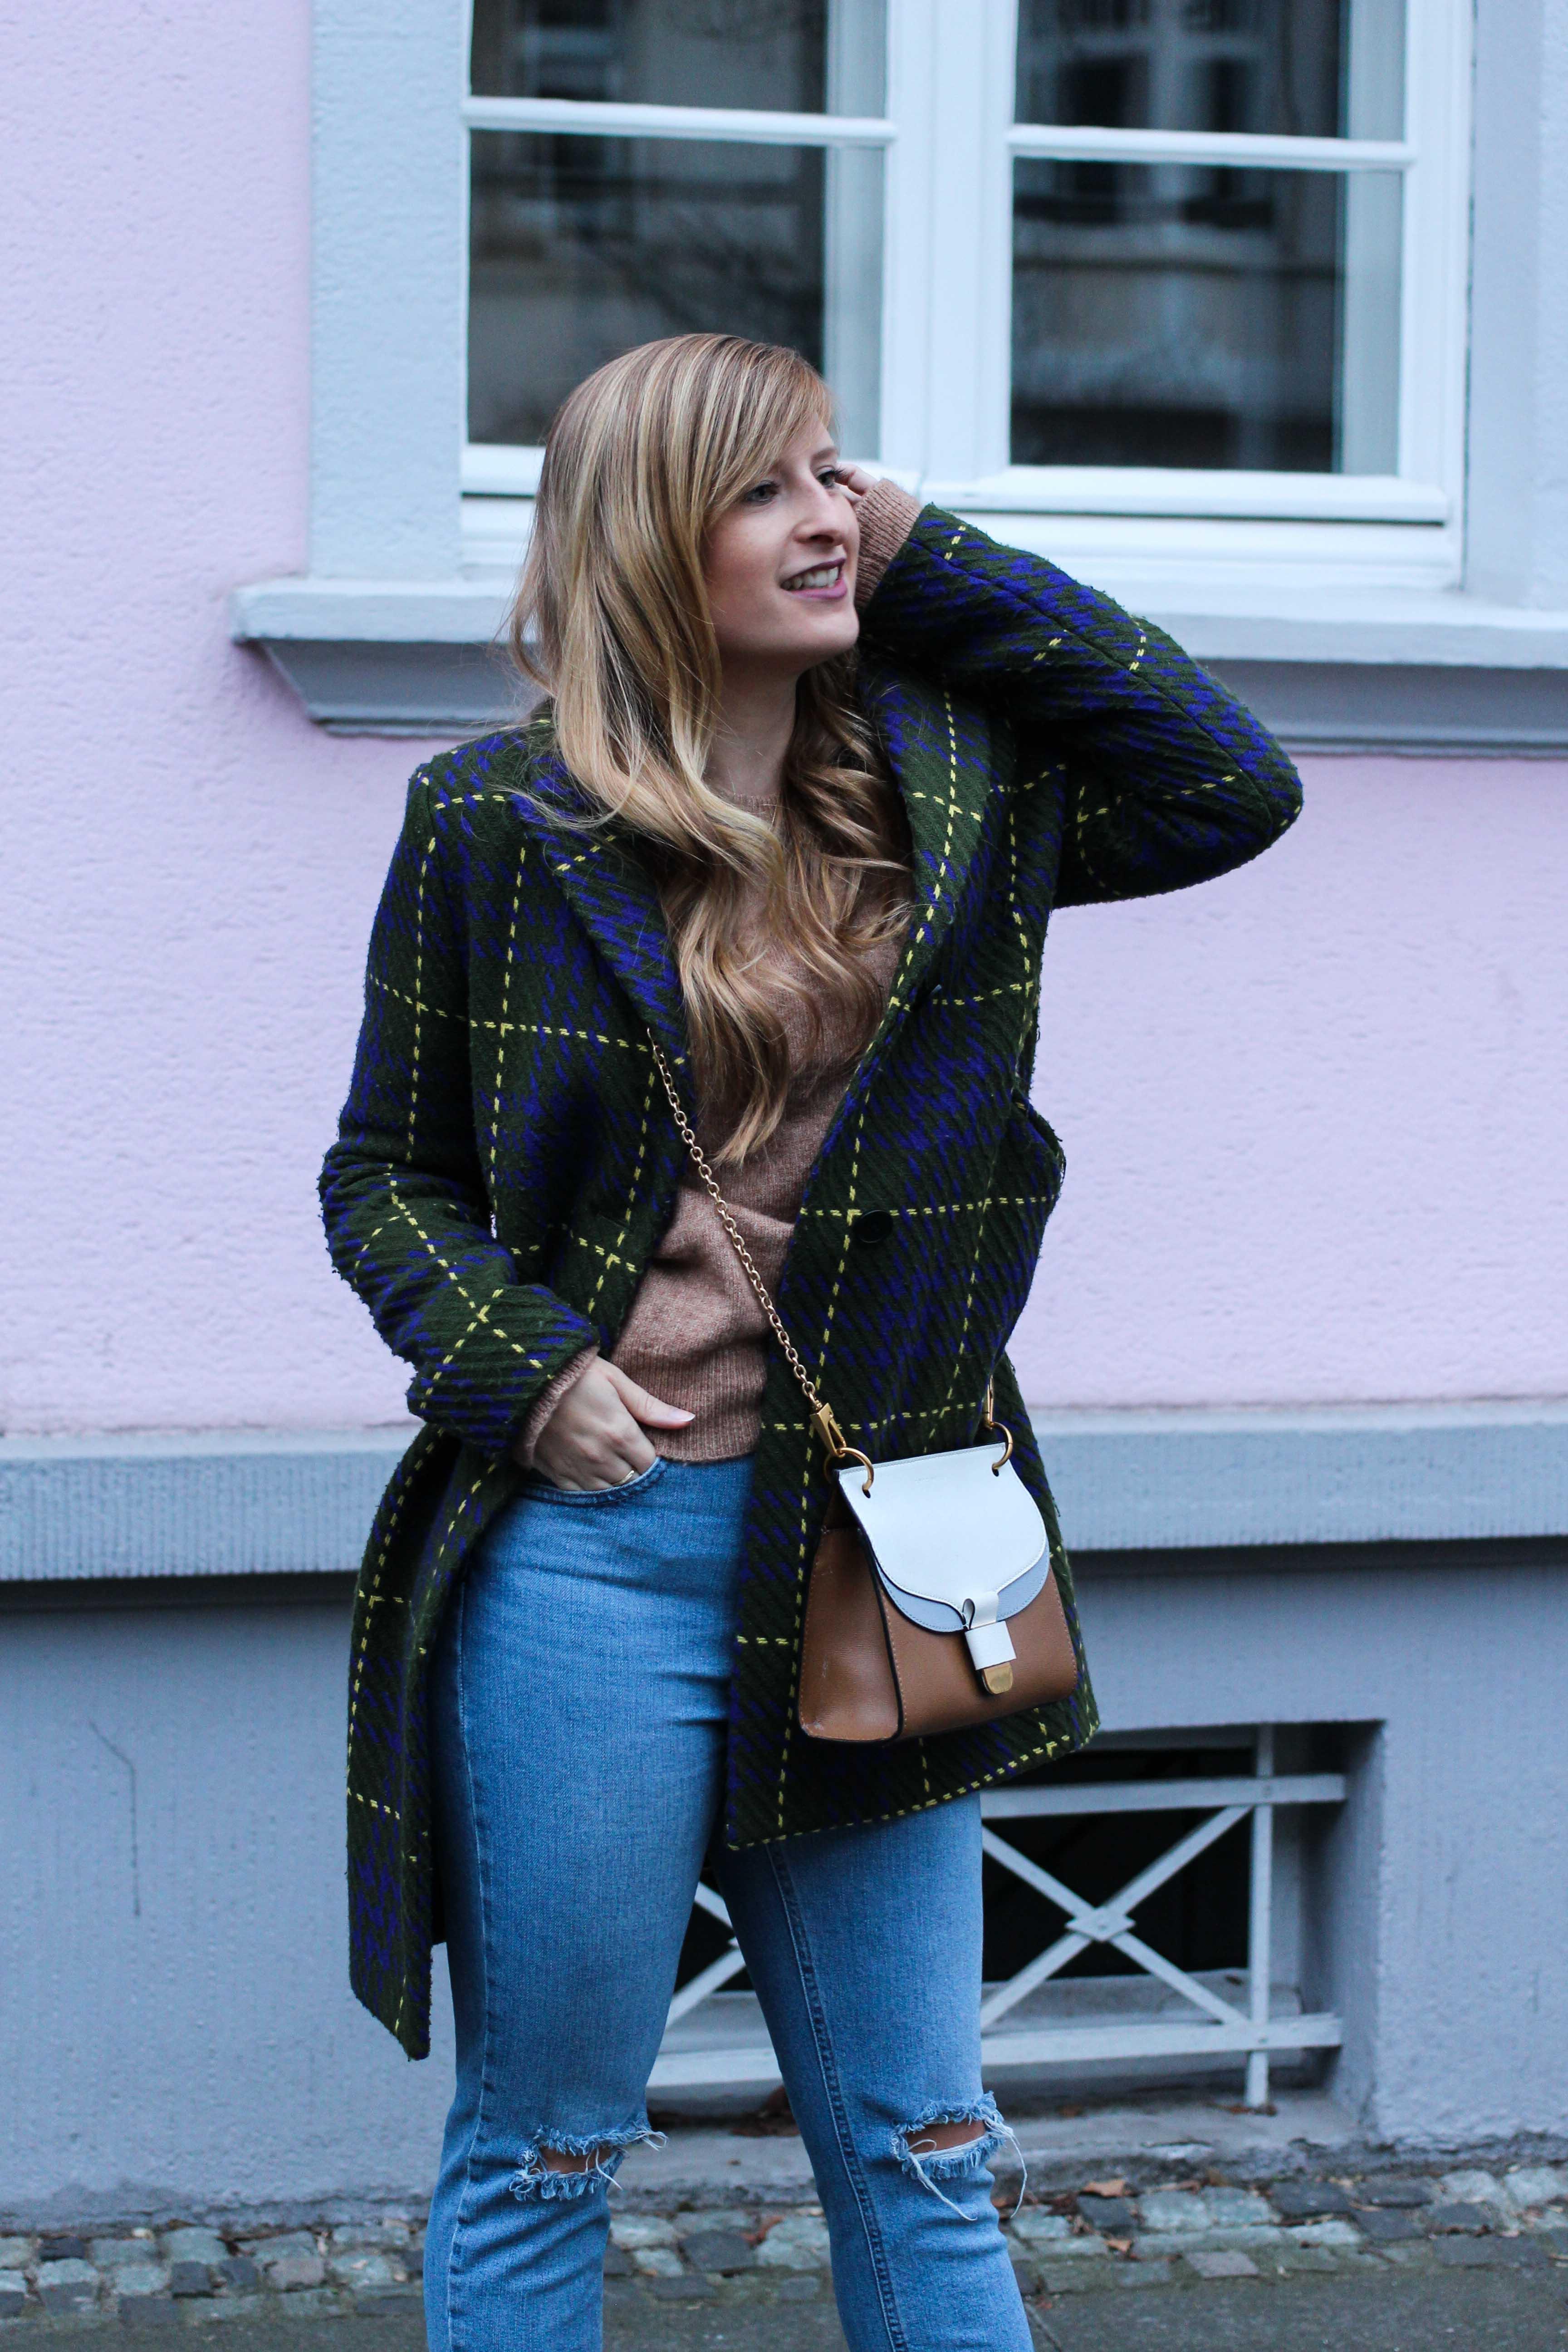 Herbst Must-Have 2019 Karomantel. Herbstmode Herbsttrend Mantel karriert Modeblog Outfit Herbst Fashion Blog Bonn 91